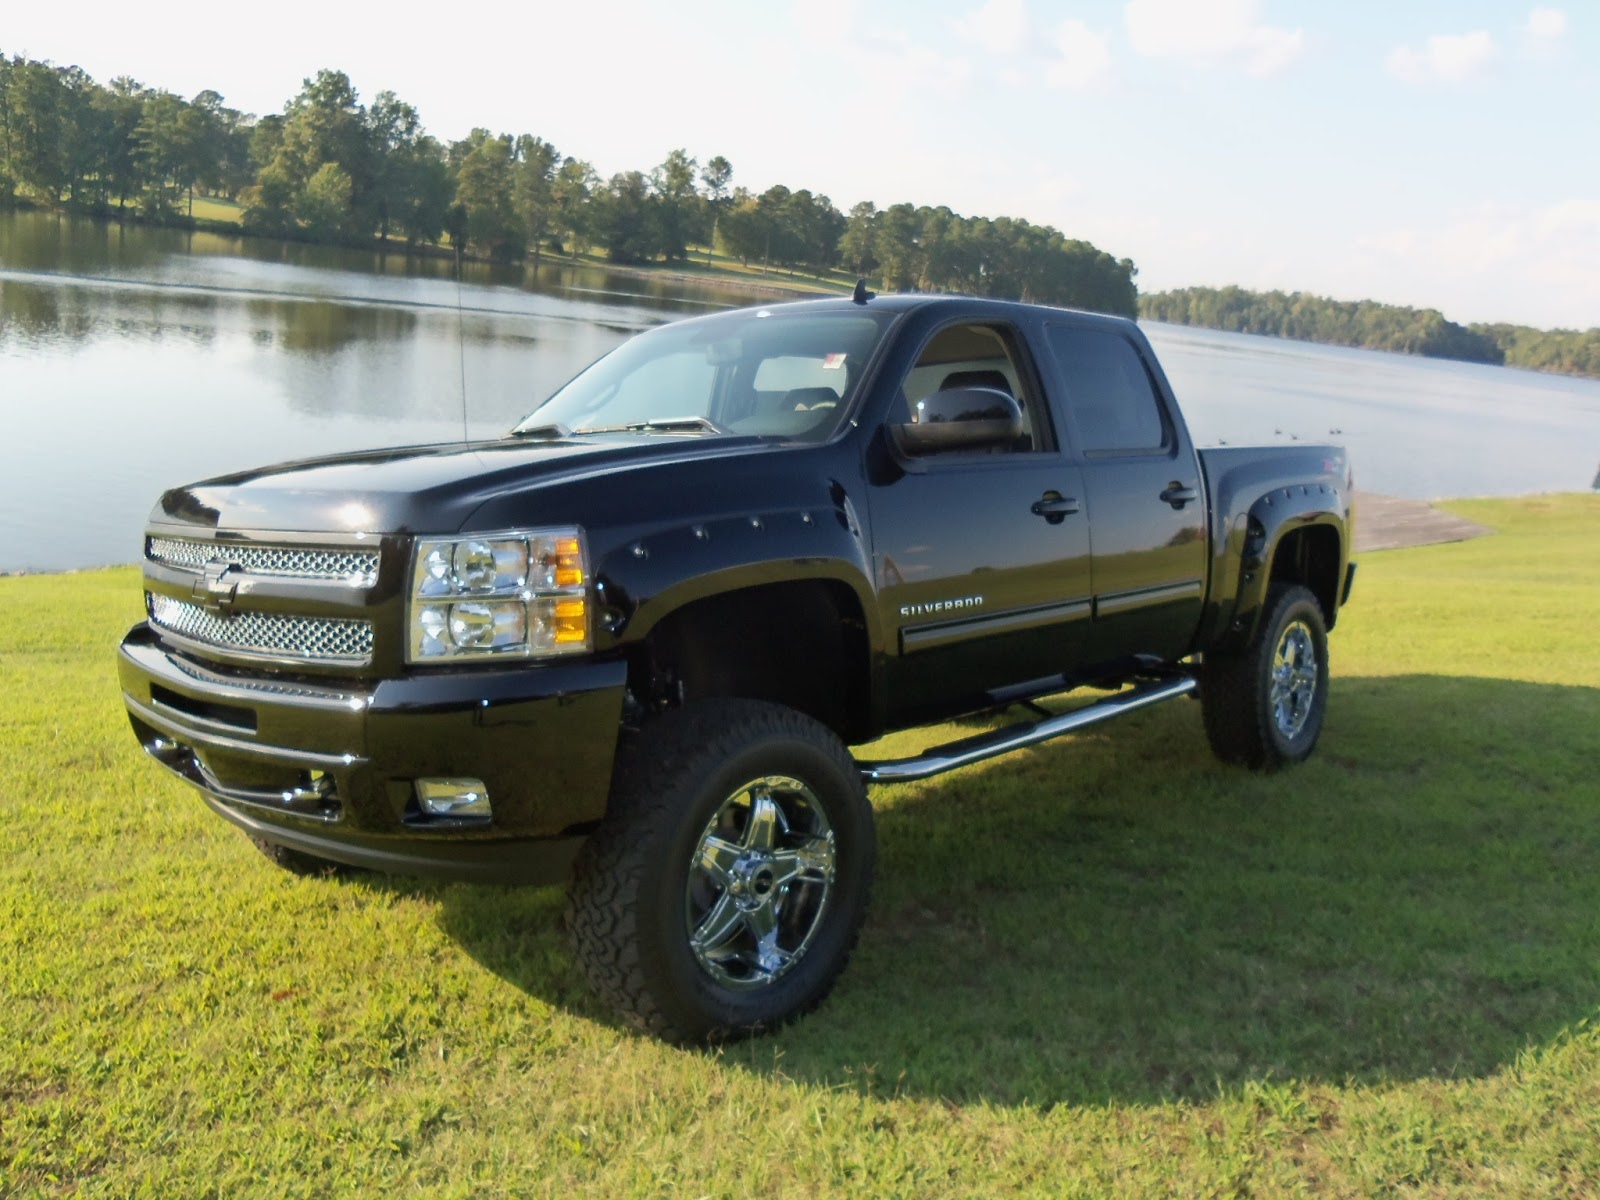 Vann York Chevy >> Vann York Chevrolet Buick GMC Cadillac: Black Rocky Ridge Chevrolet Silverado .. .Cruise...